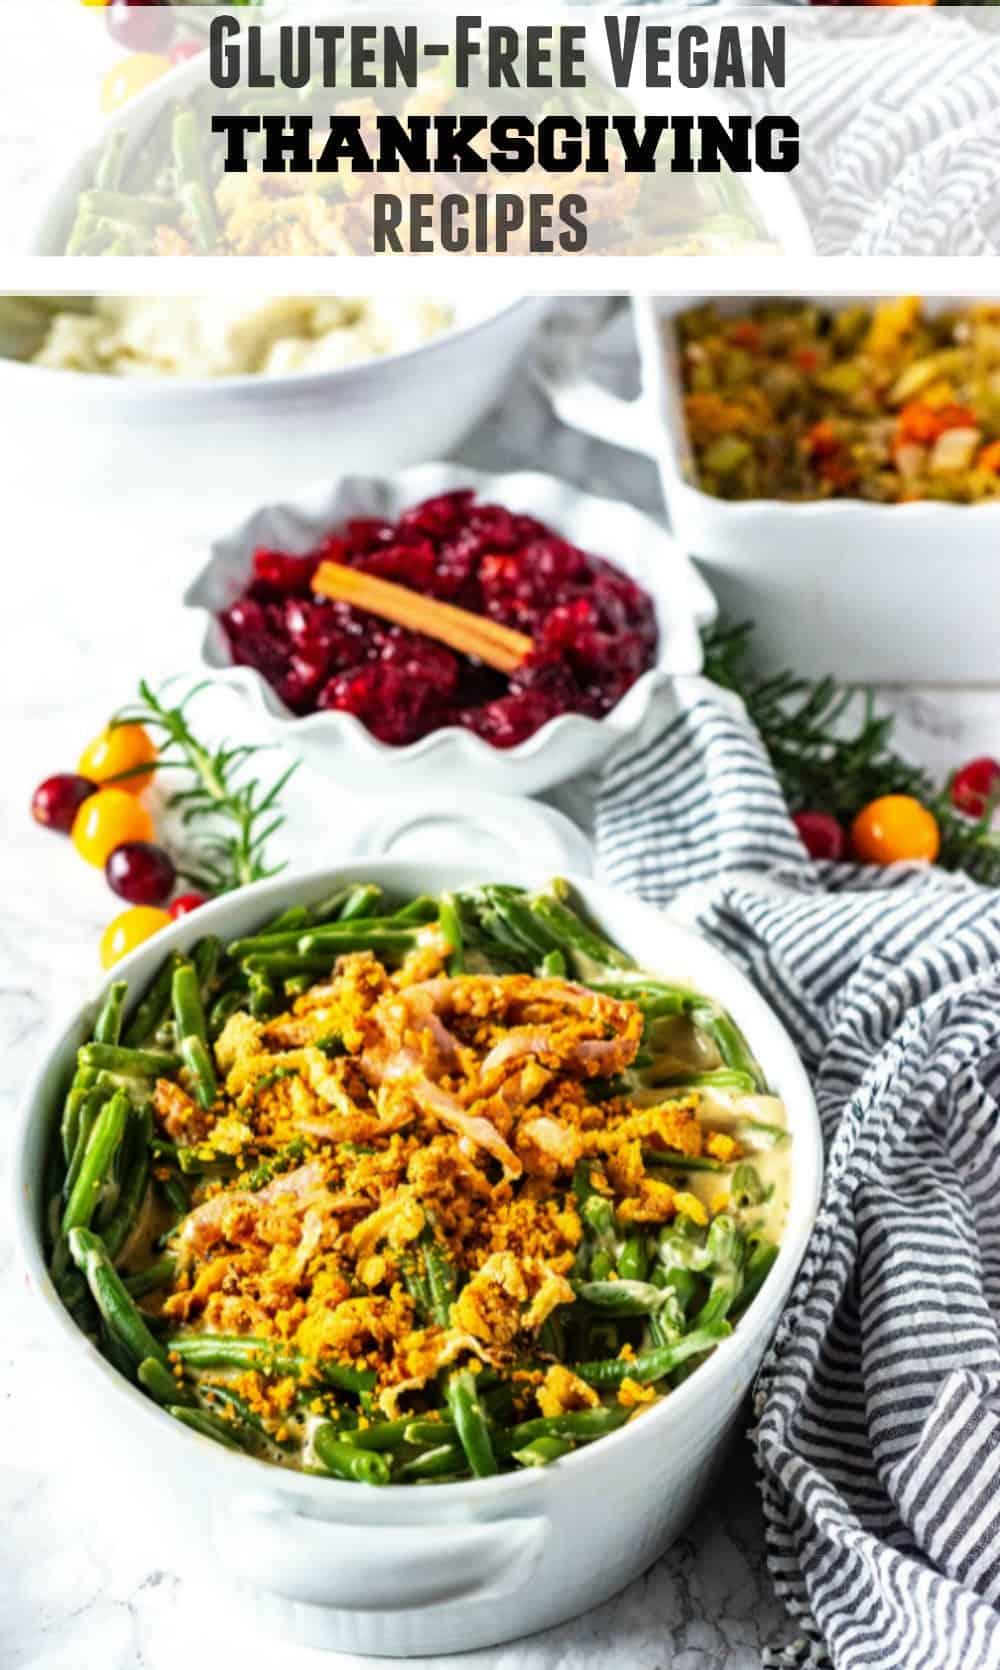 Gluten-Free Vegan Thanksgiving Recipes